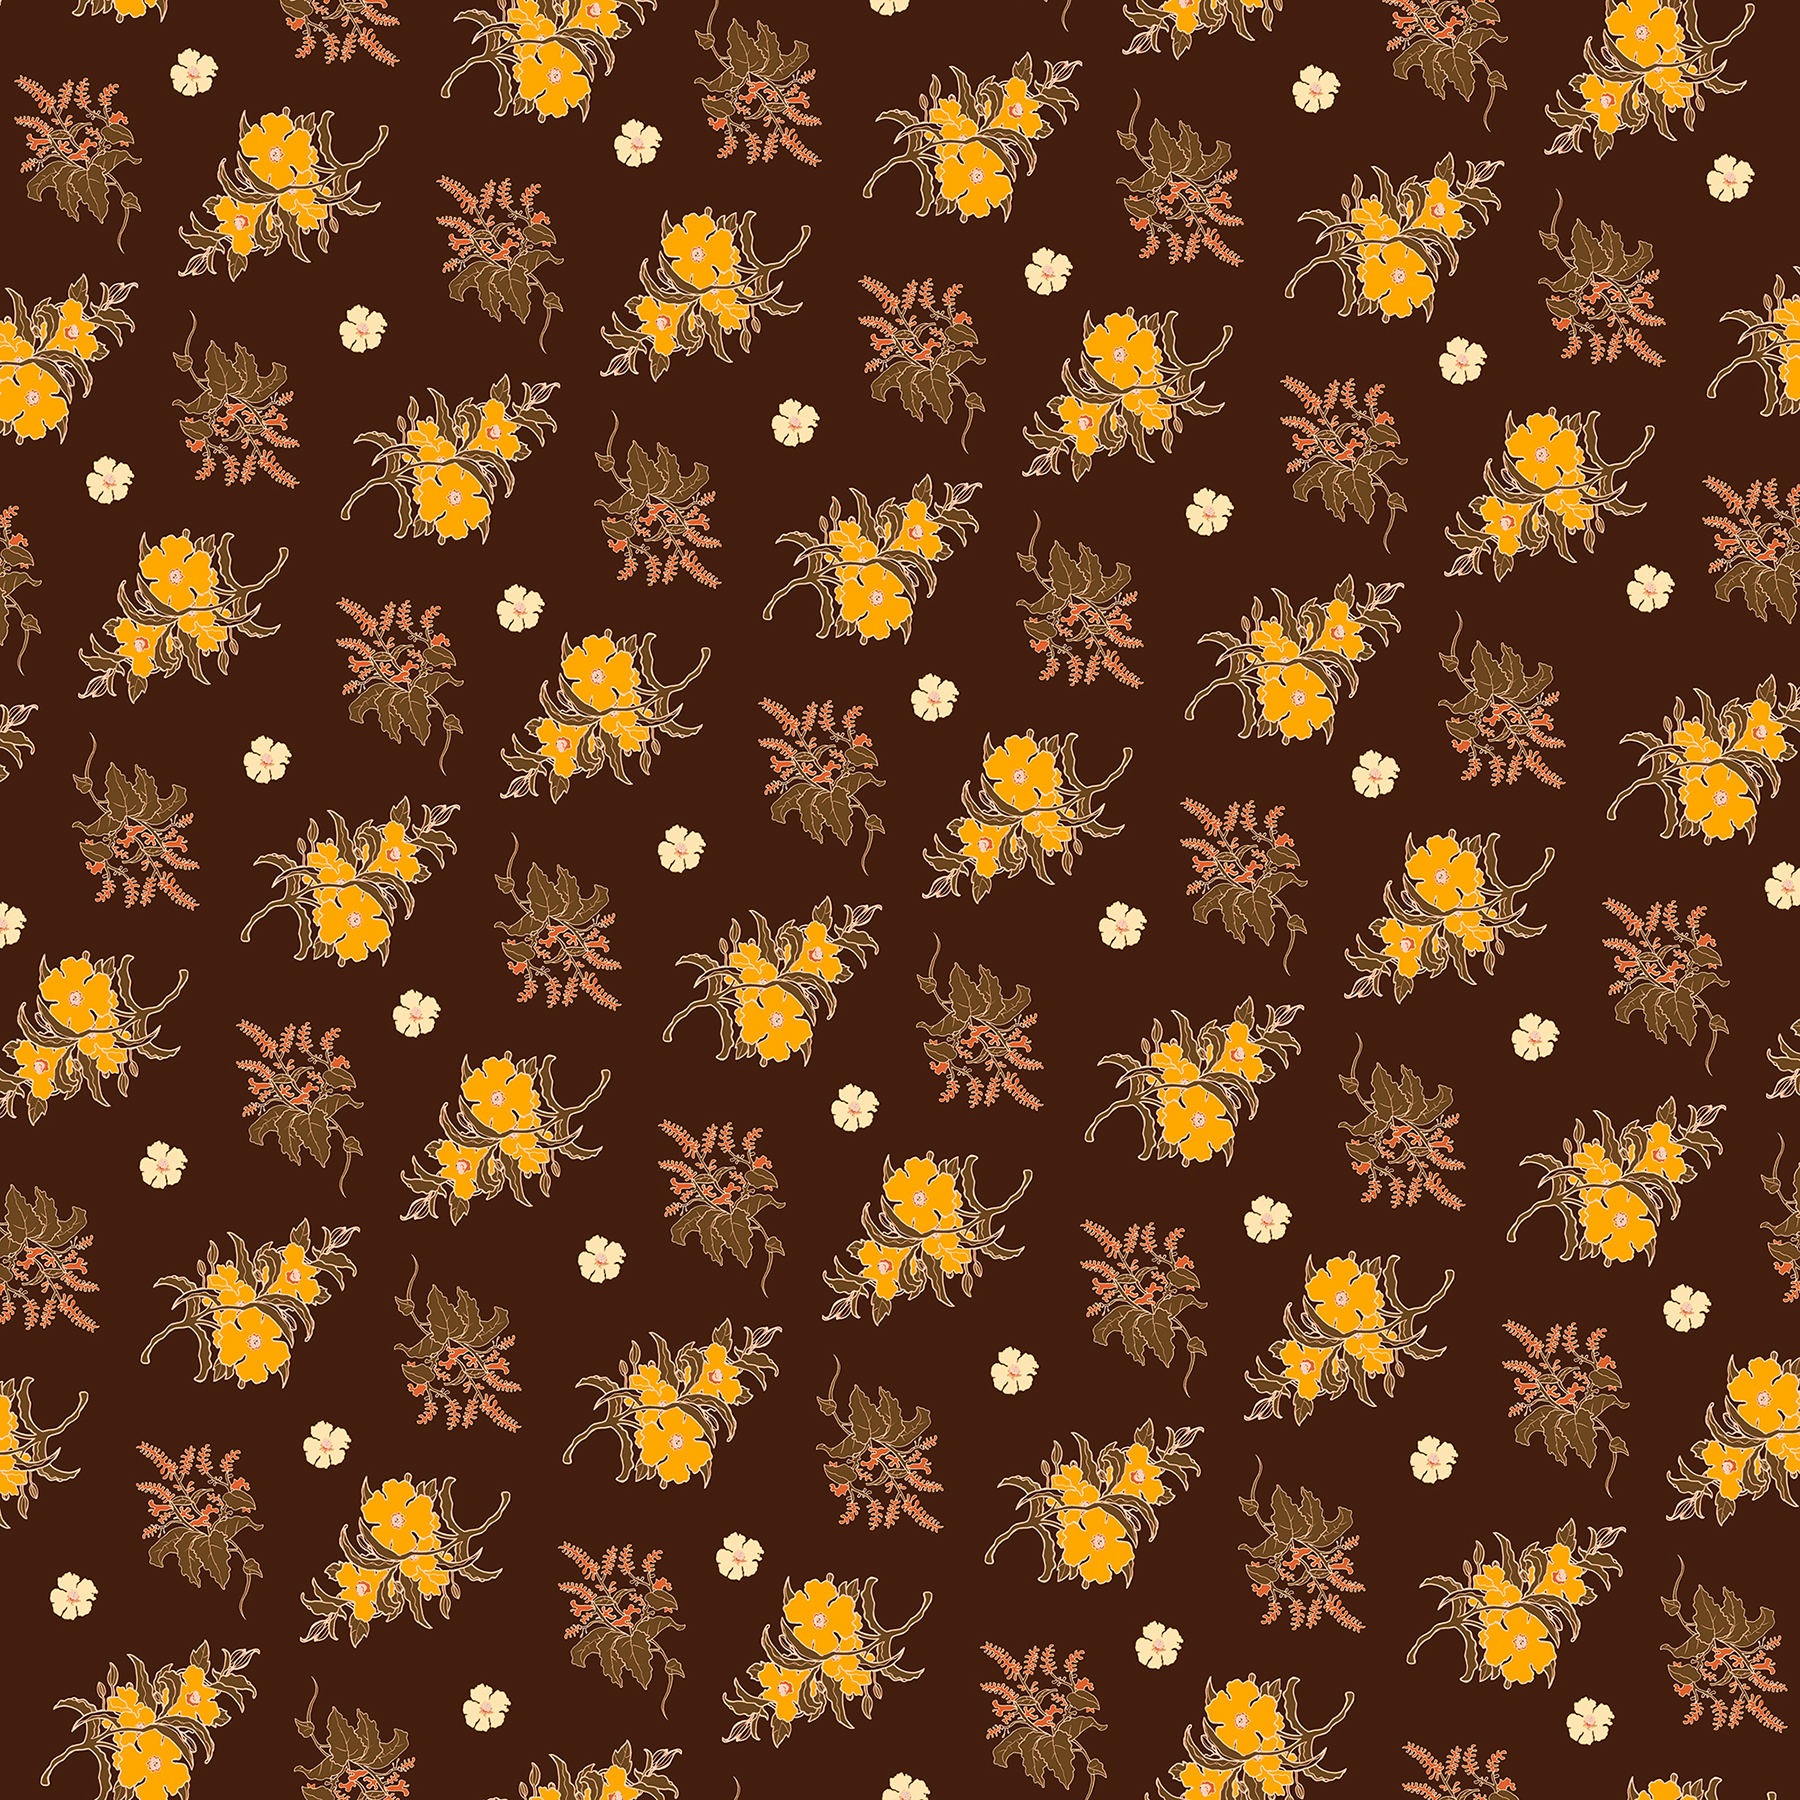 JV Floral Branch Pattern 1